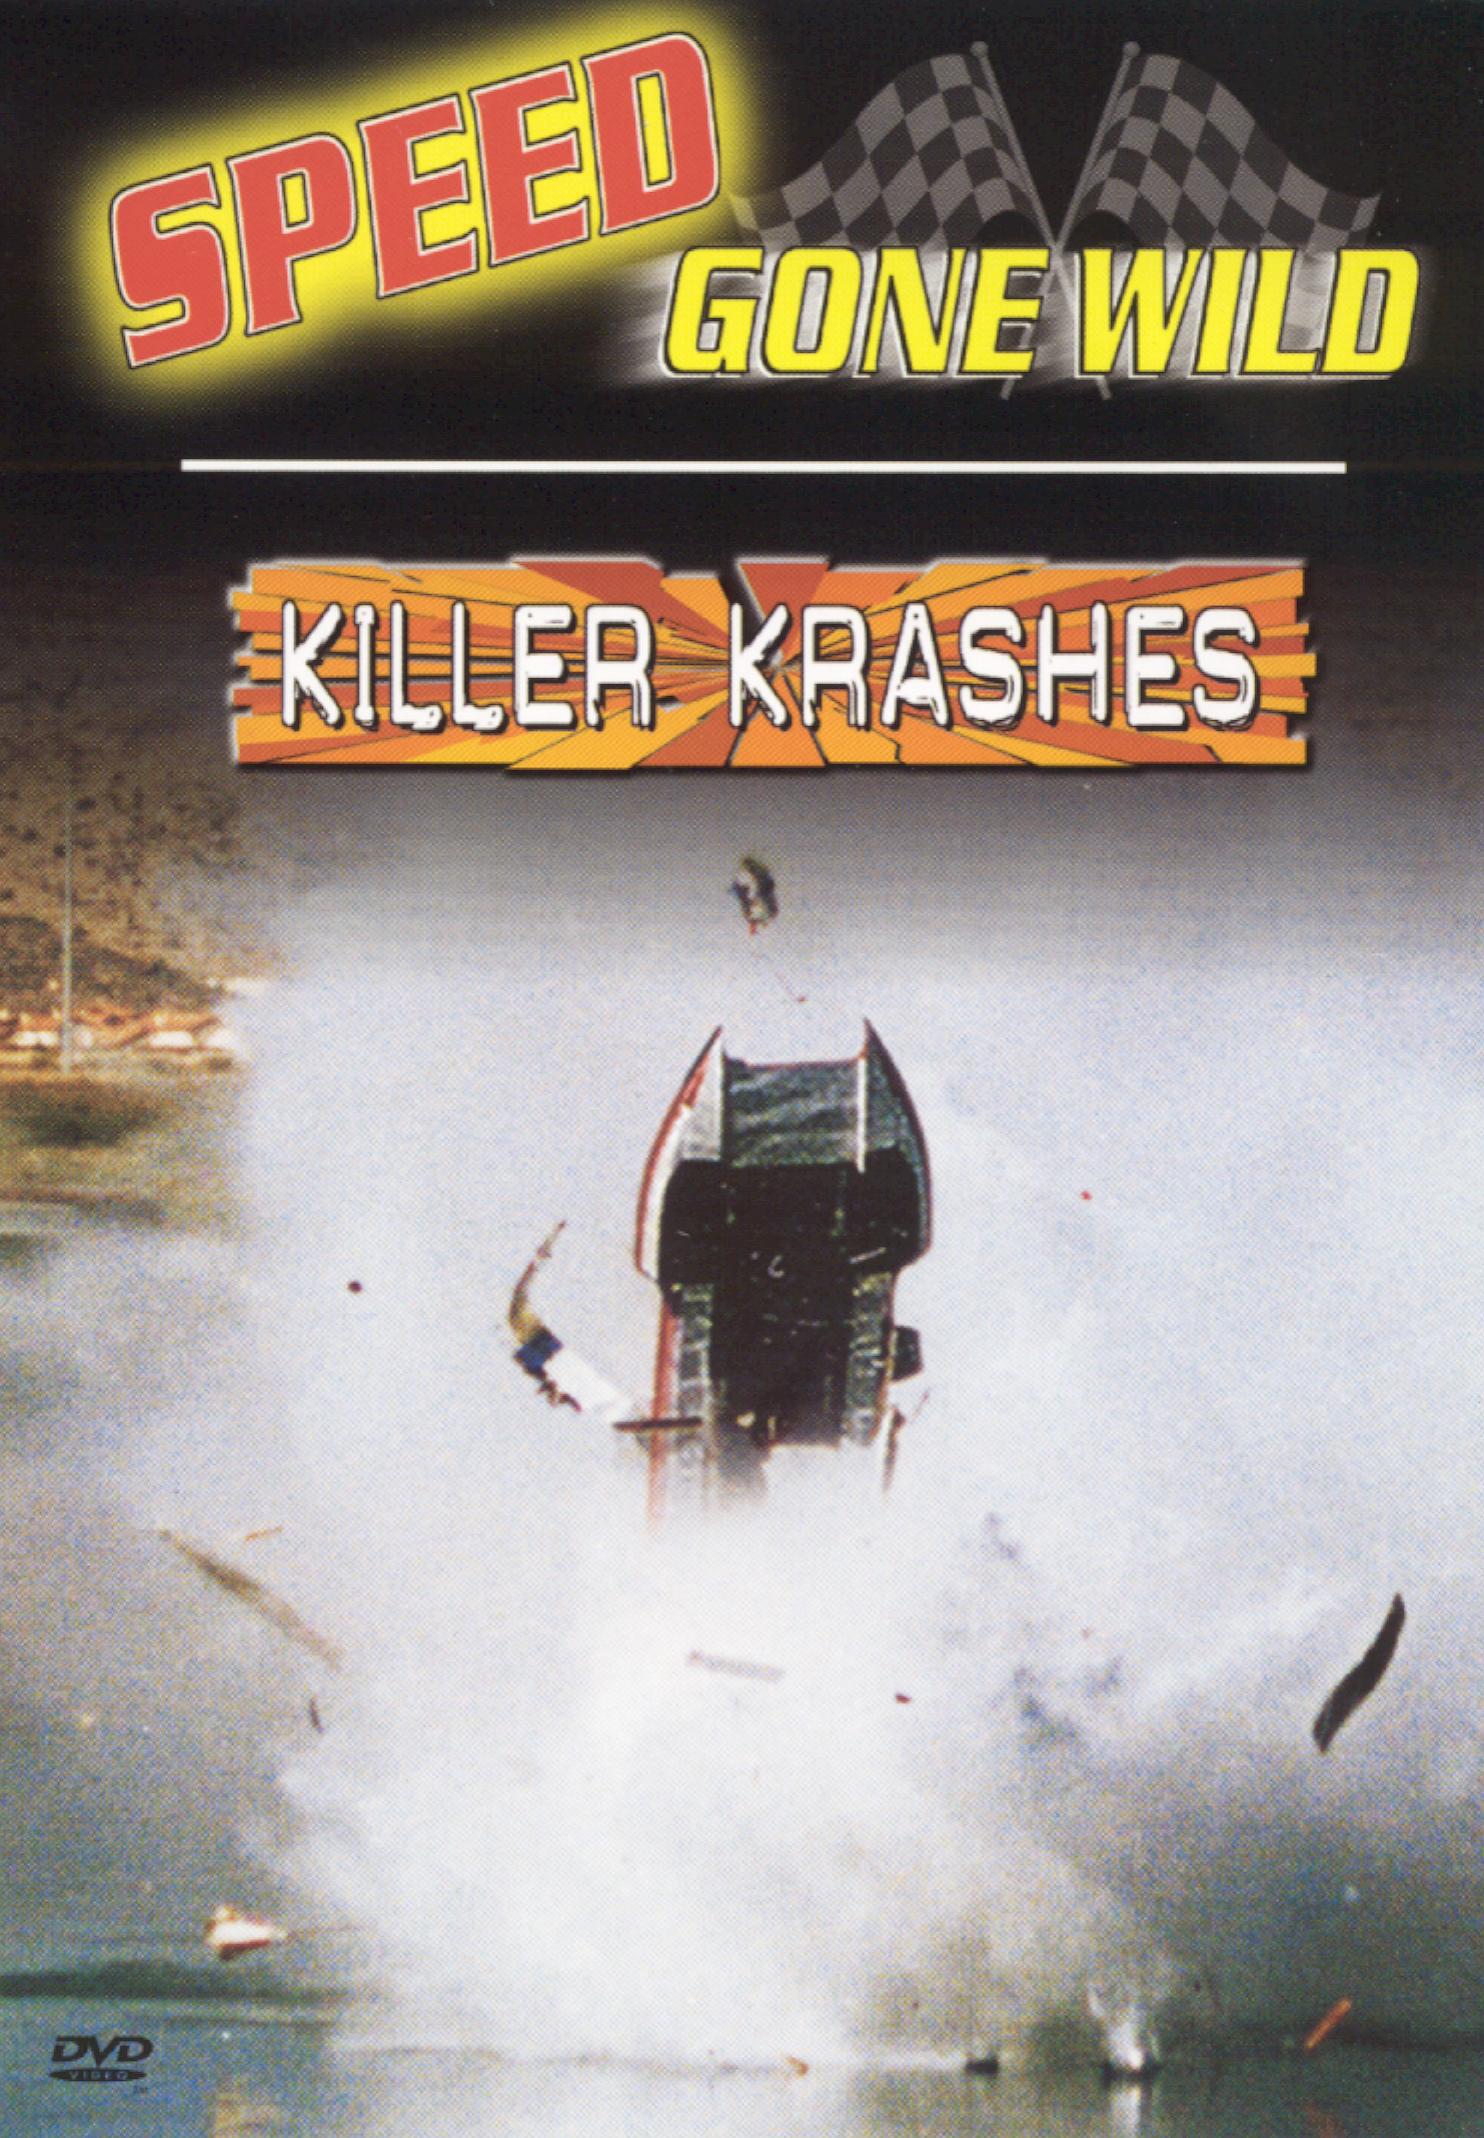 Speed Gone Wild: Killer Krashes